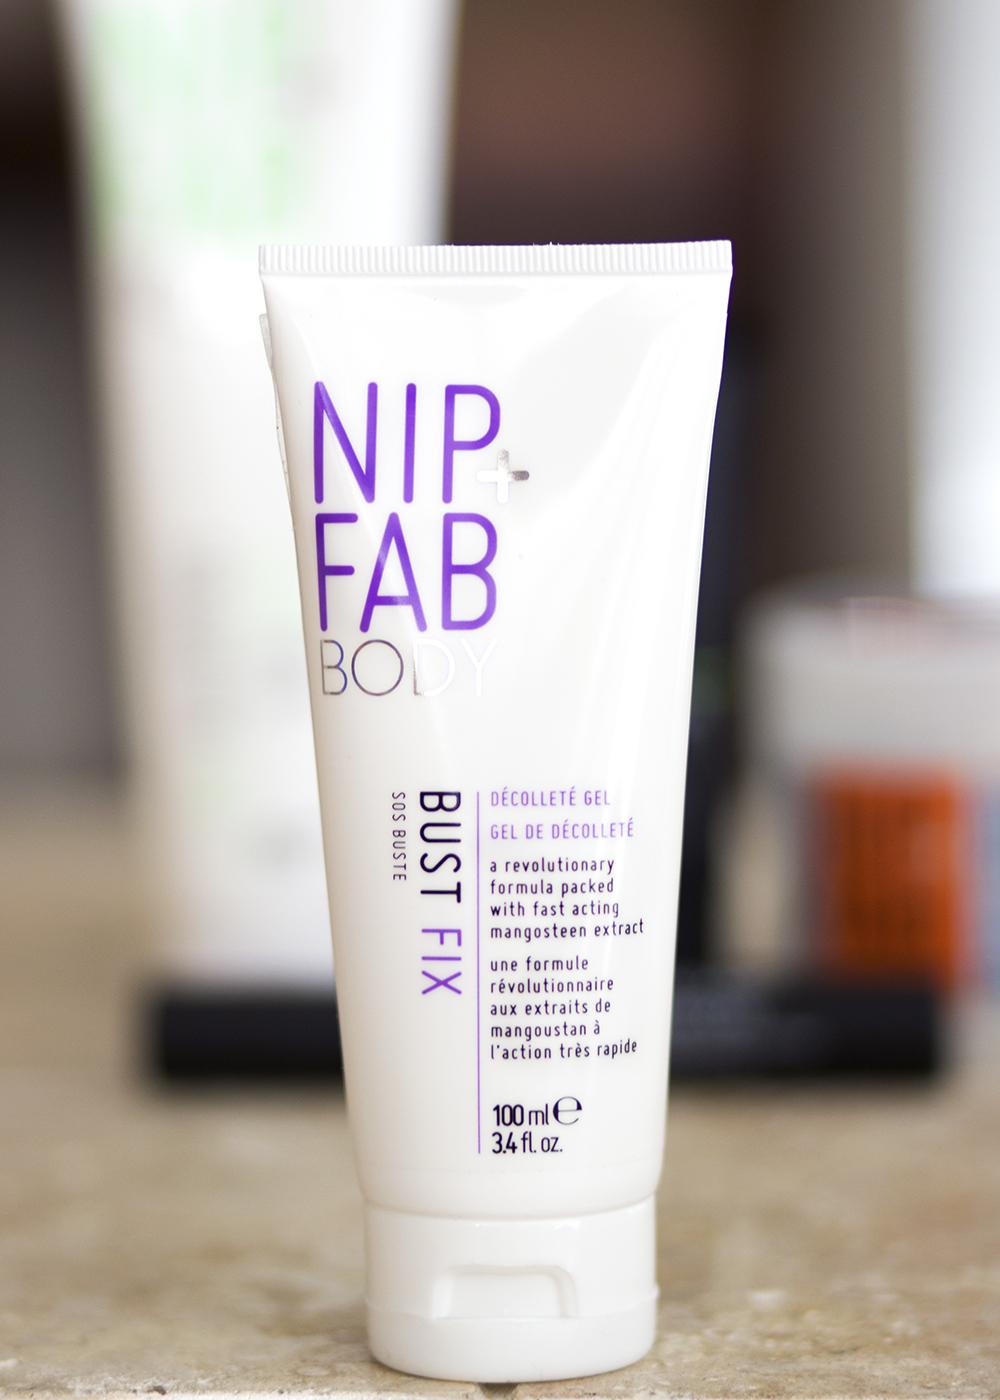 Rodial and Nip + Fab Beauty - Nip + Fab Body Bust Fix Décolleté Gel - Rodial Nip Fab Beauty Review